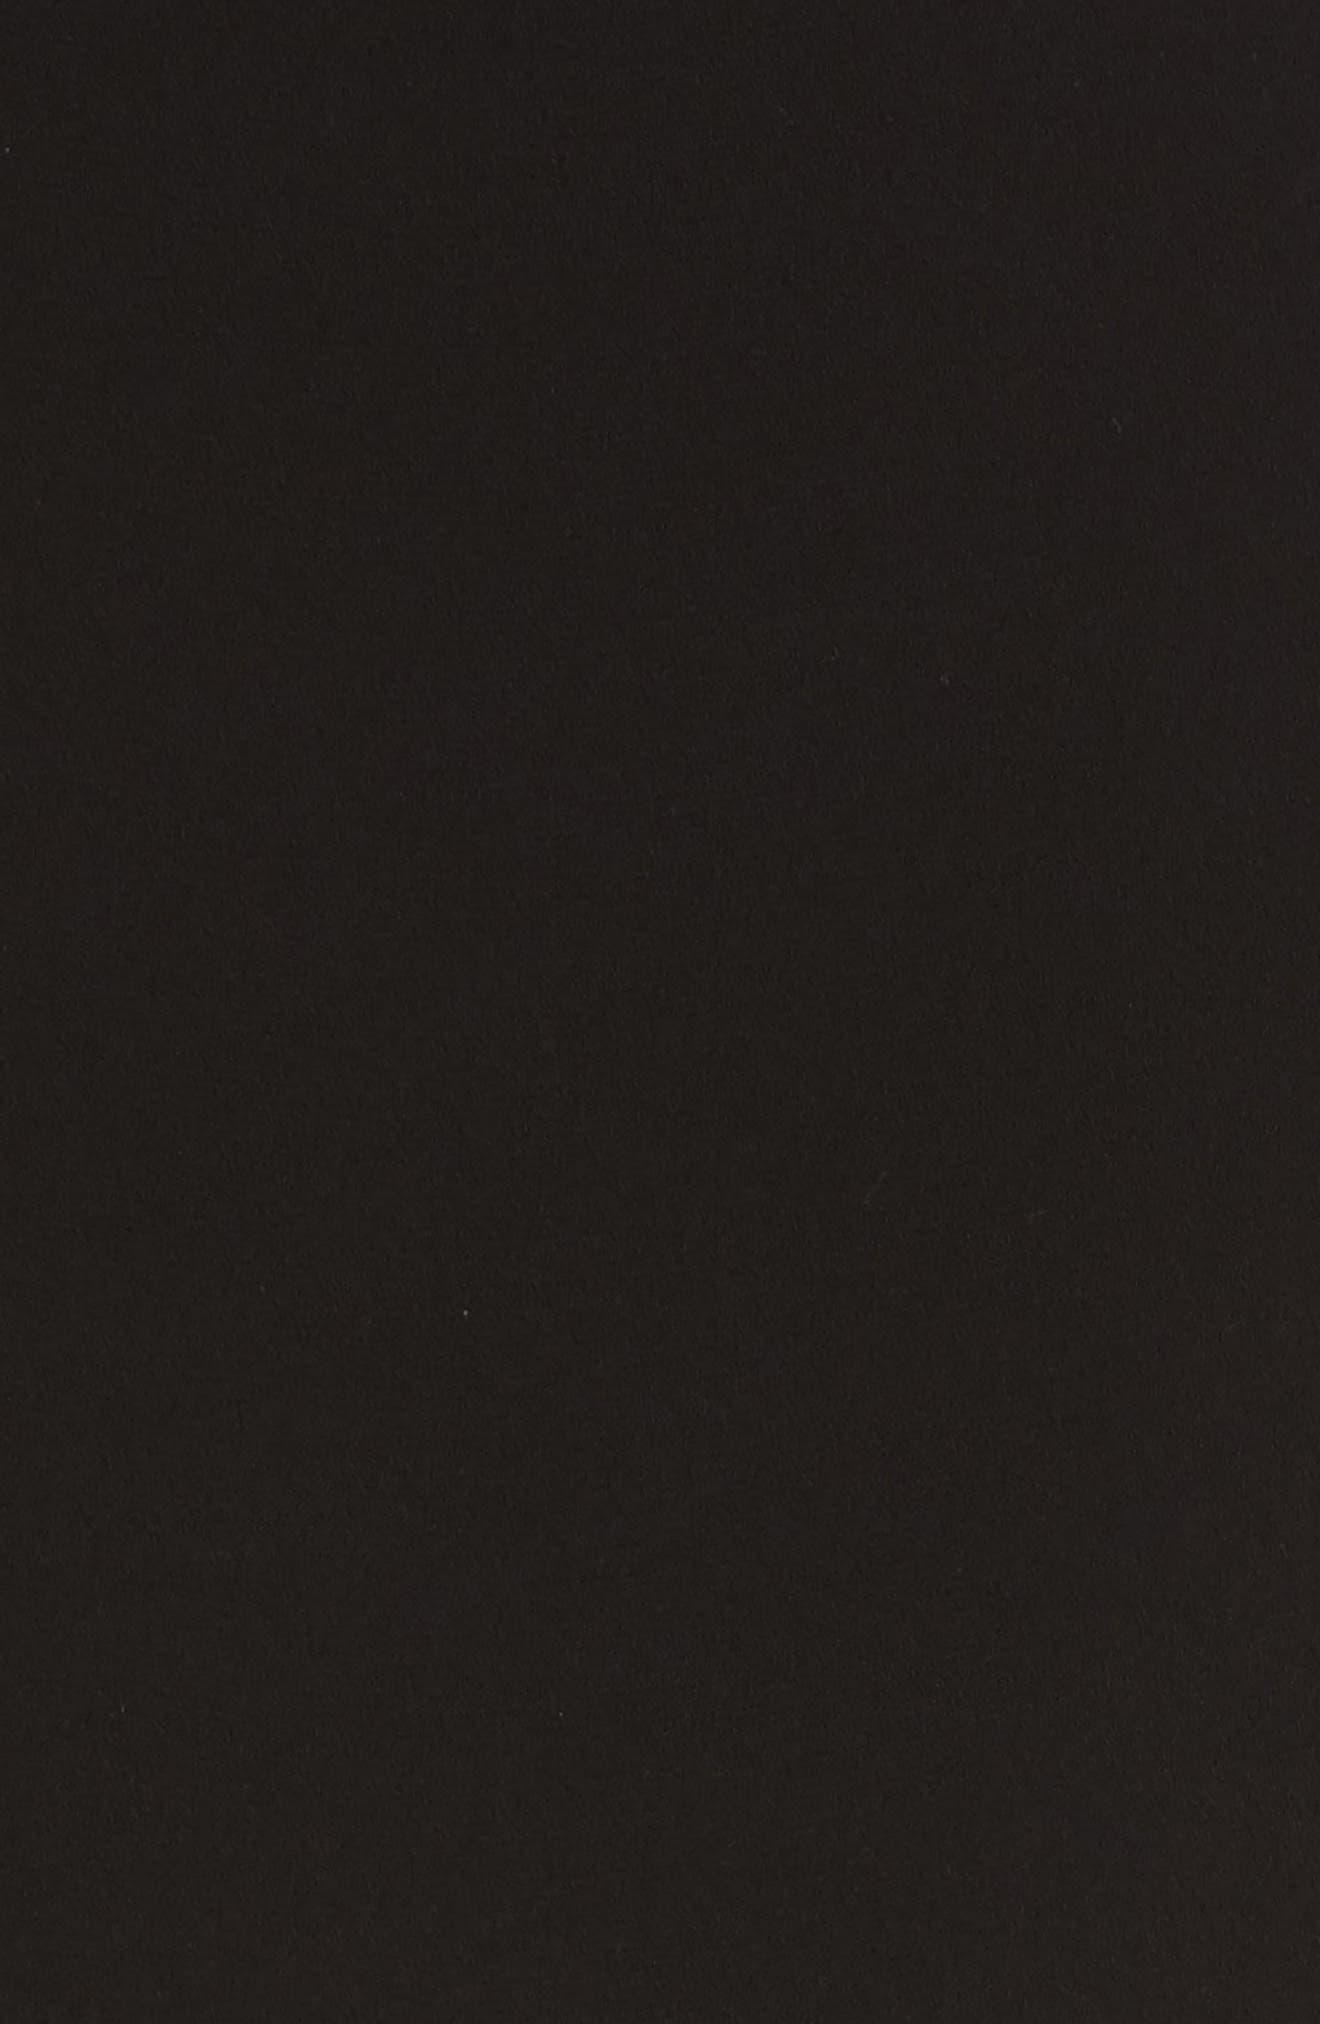 Ekon Fringe Hem Dress,                             Alternate thumbnail 5, color,                             Black